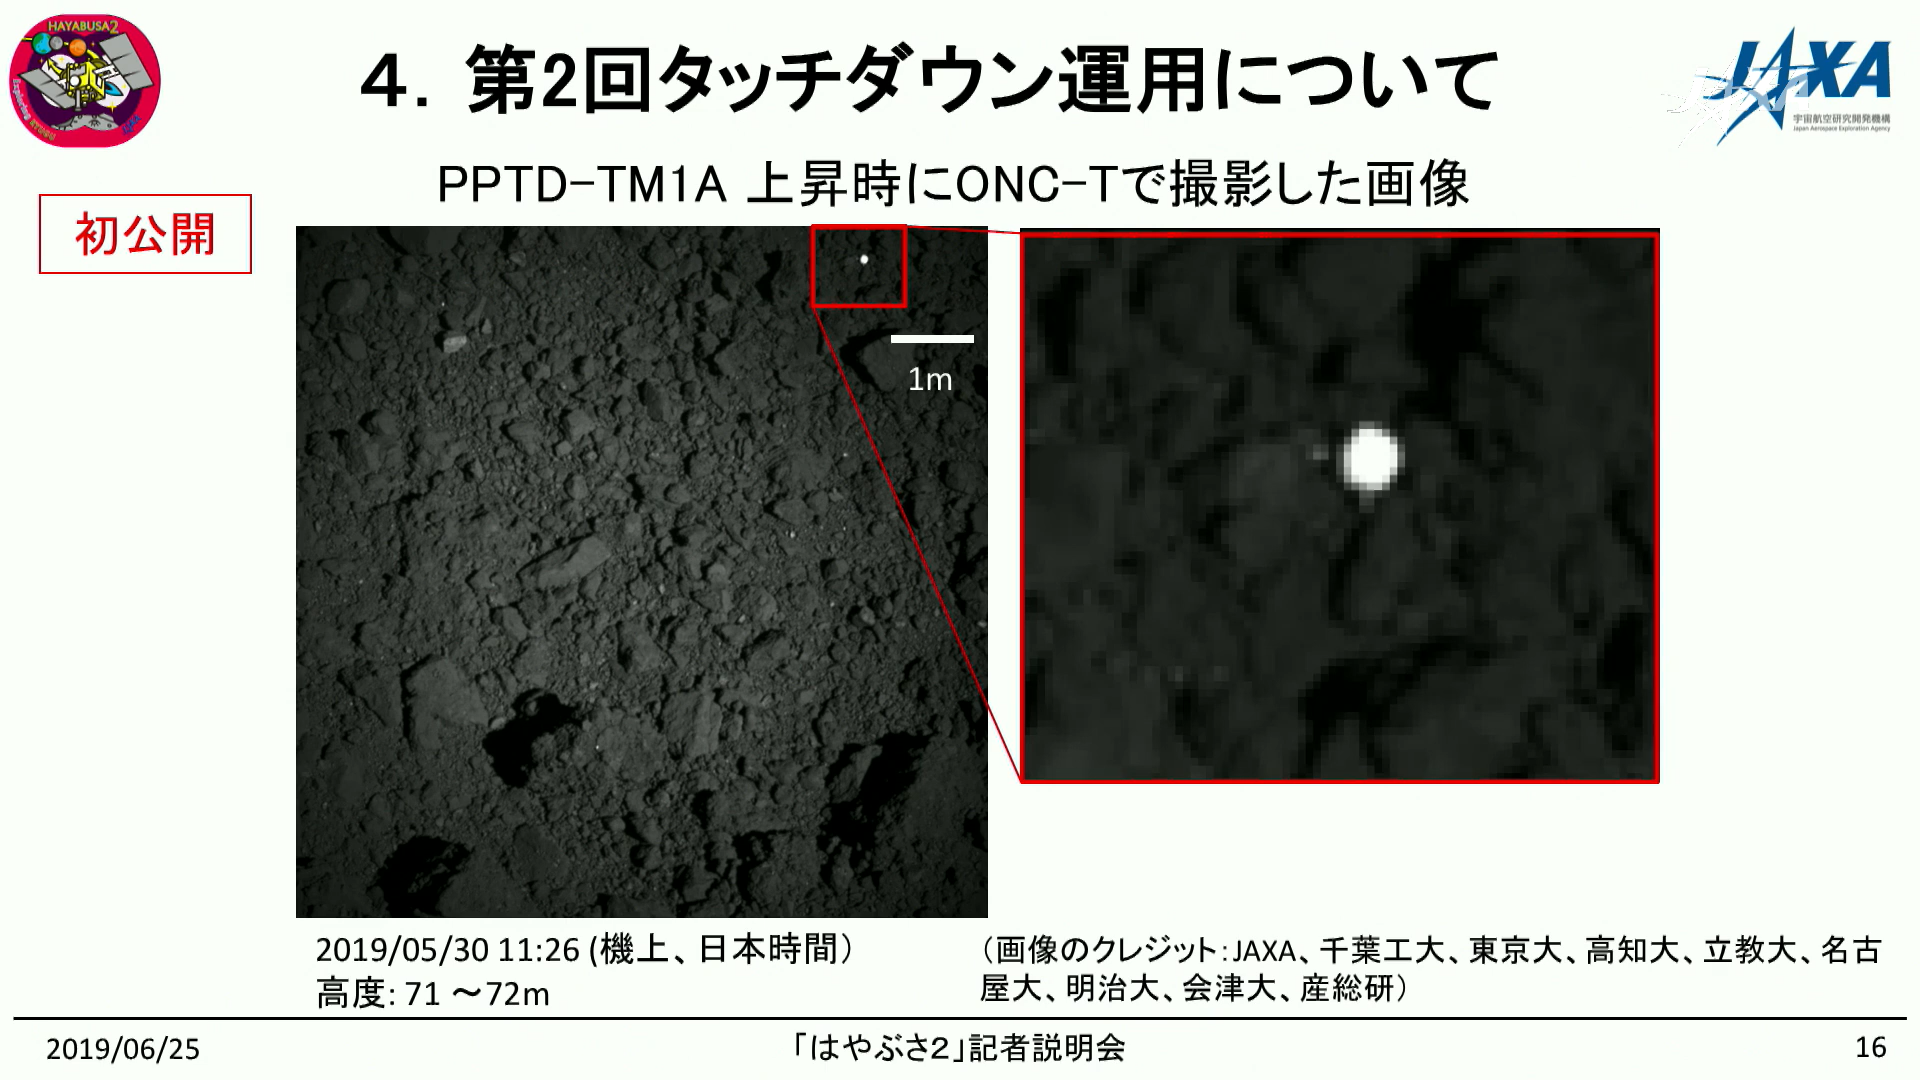 f:id:Imamura:20190625234809p:plain